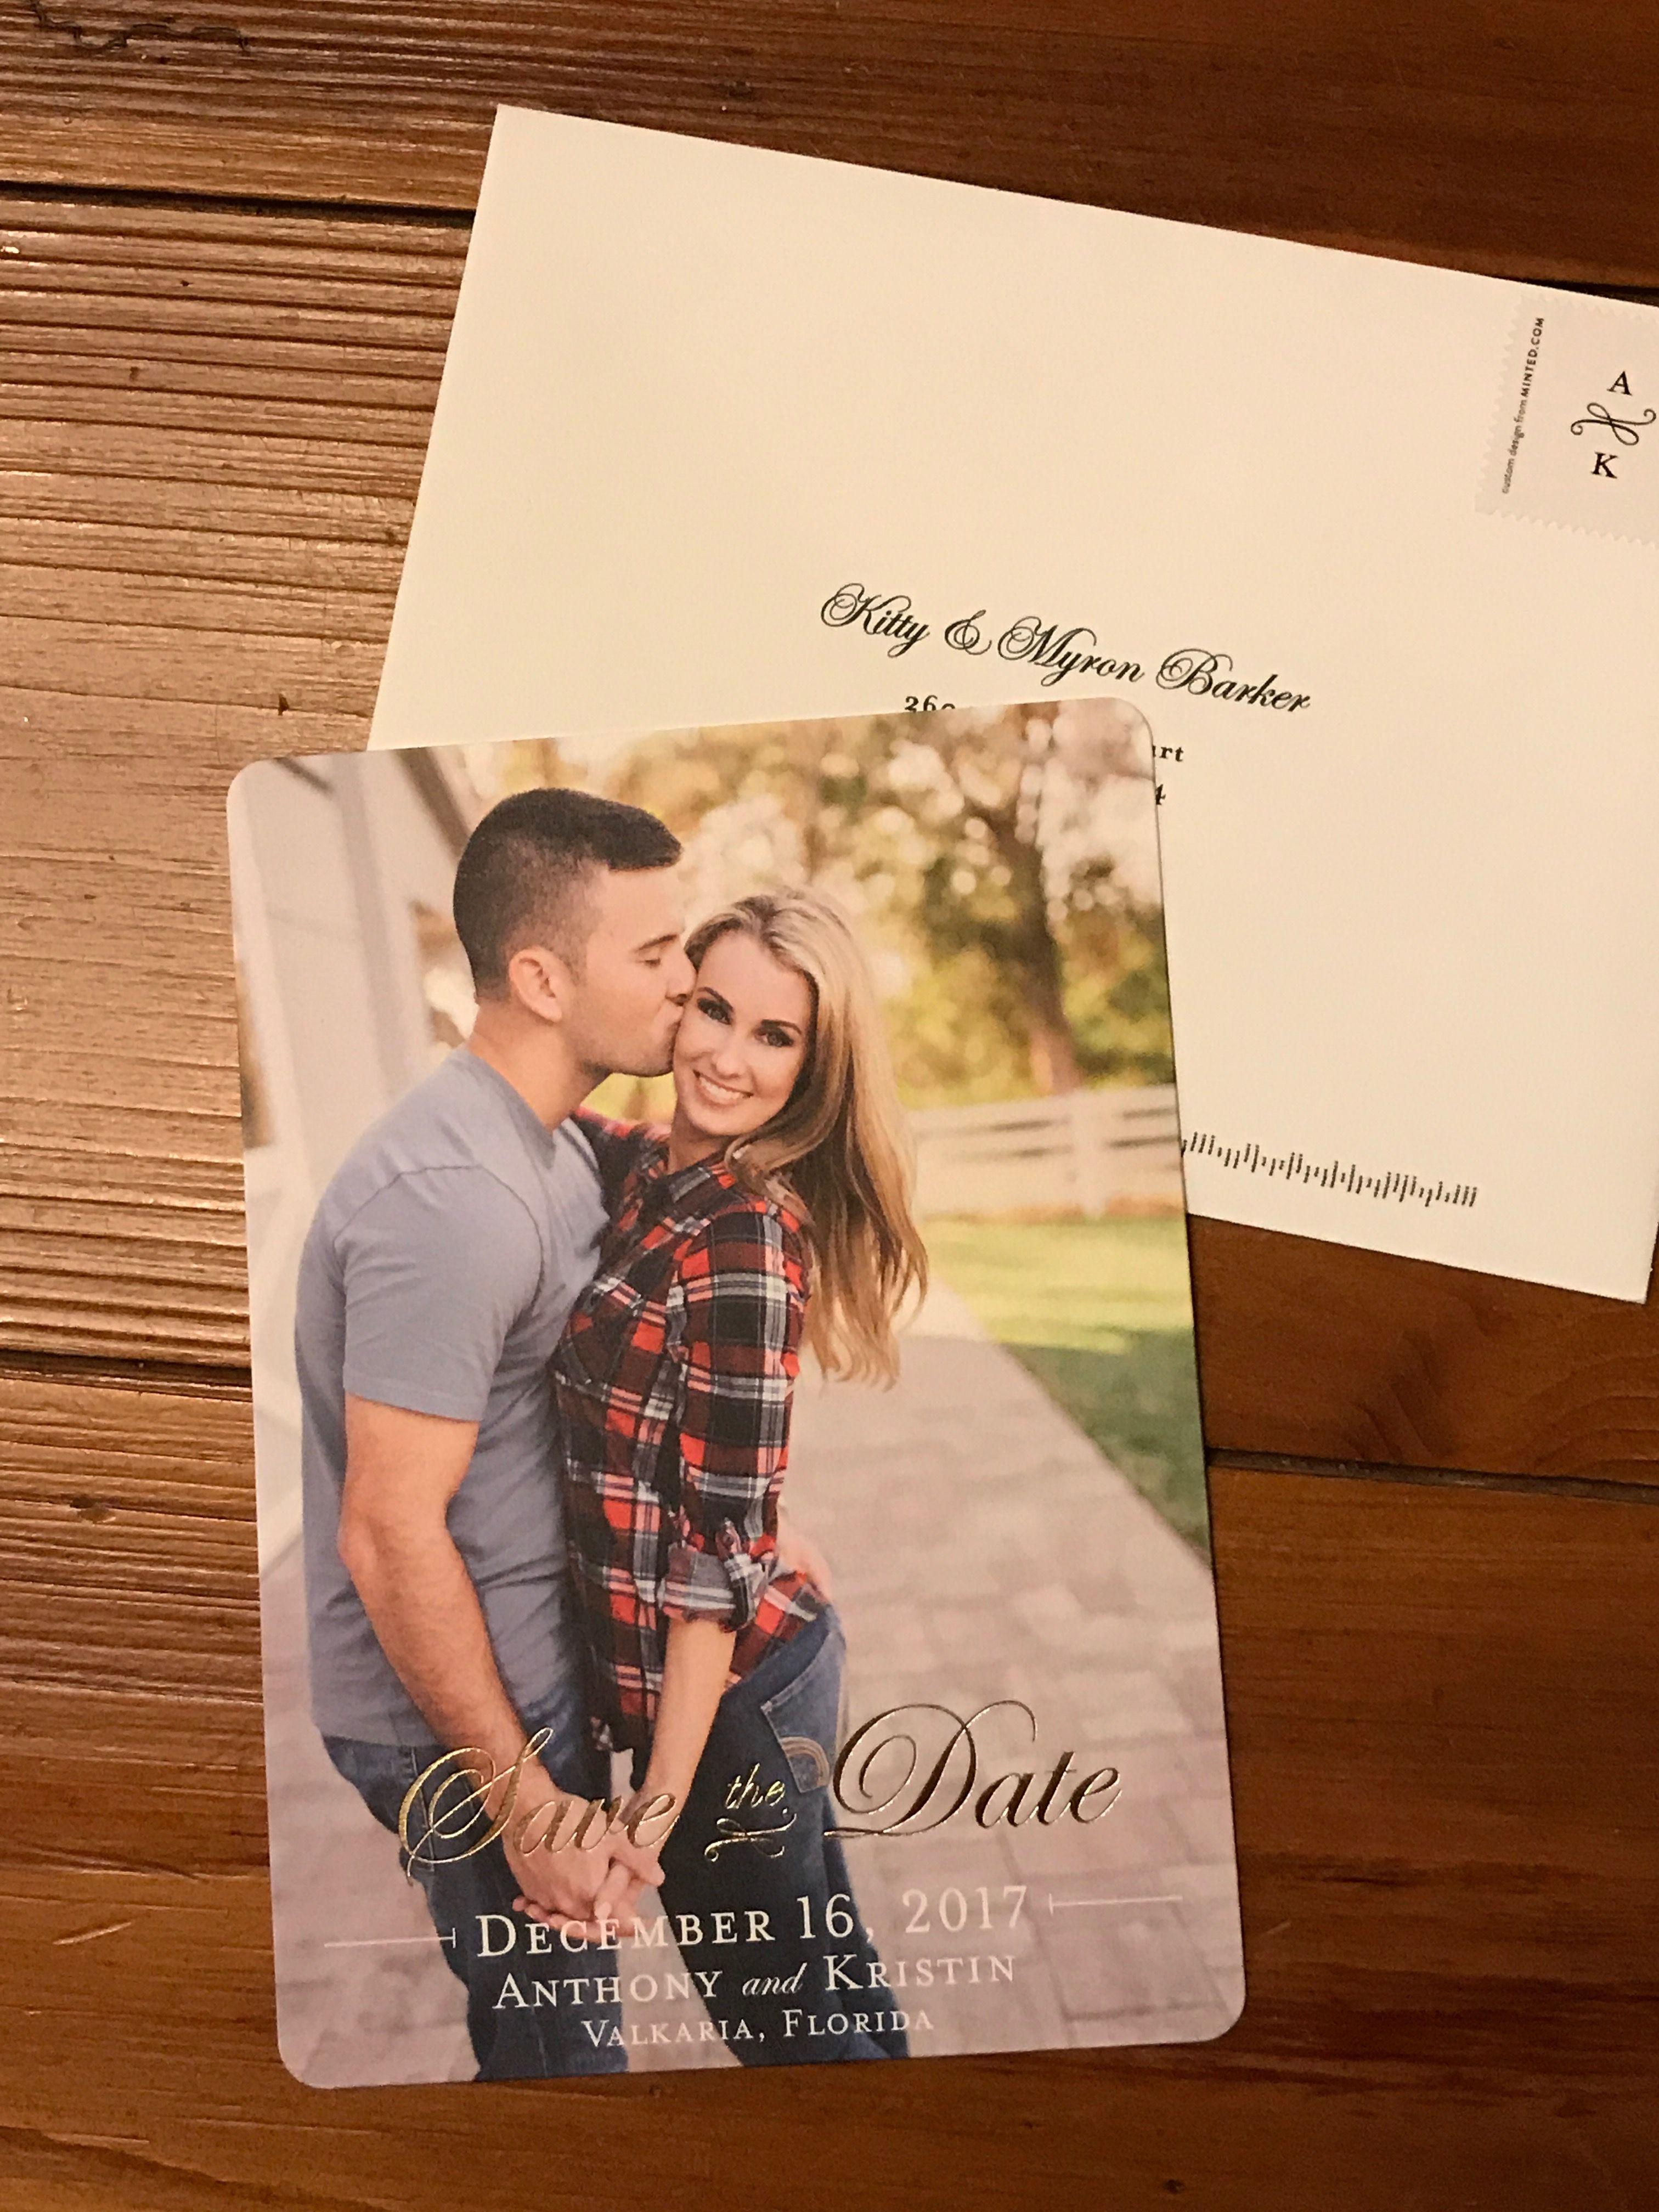 Wedding decorations garden theme december 2018 Pin by Kitty Barker on Wedding day December  in   Pinterest